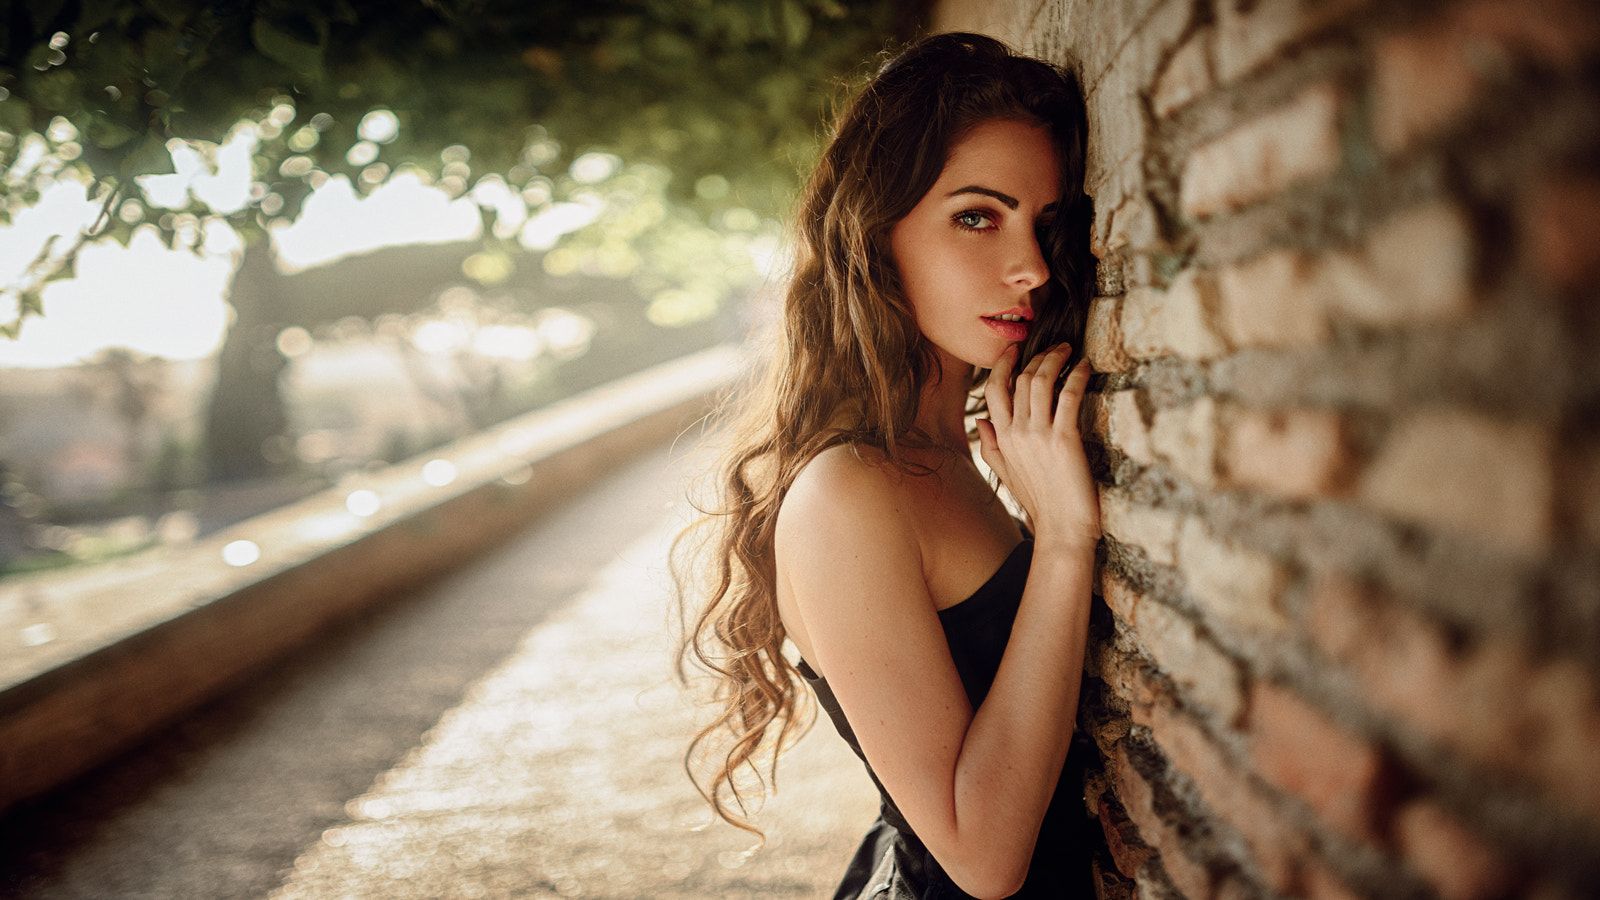 People 1600x900 Georgy Chernyadyev women model long hair wavy hair auburn hair bare shoulders dress face looking at viewer depth of field